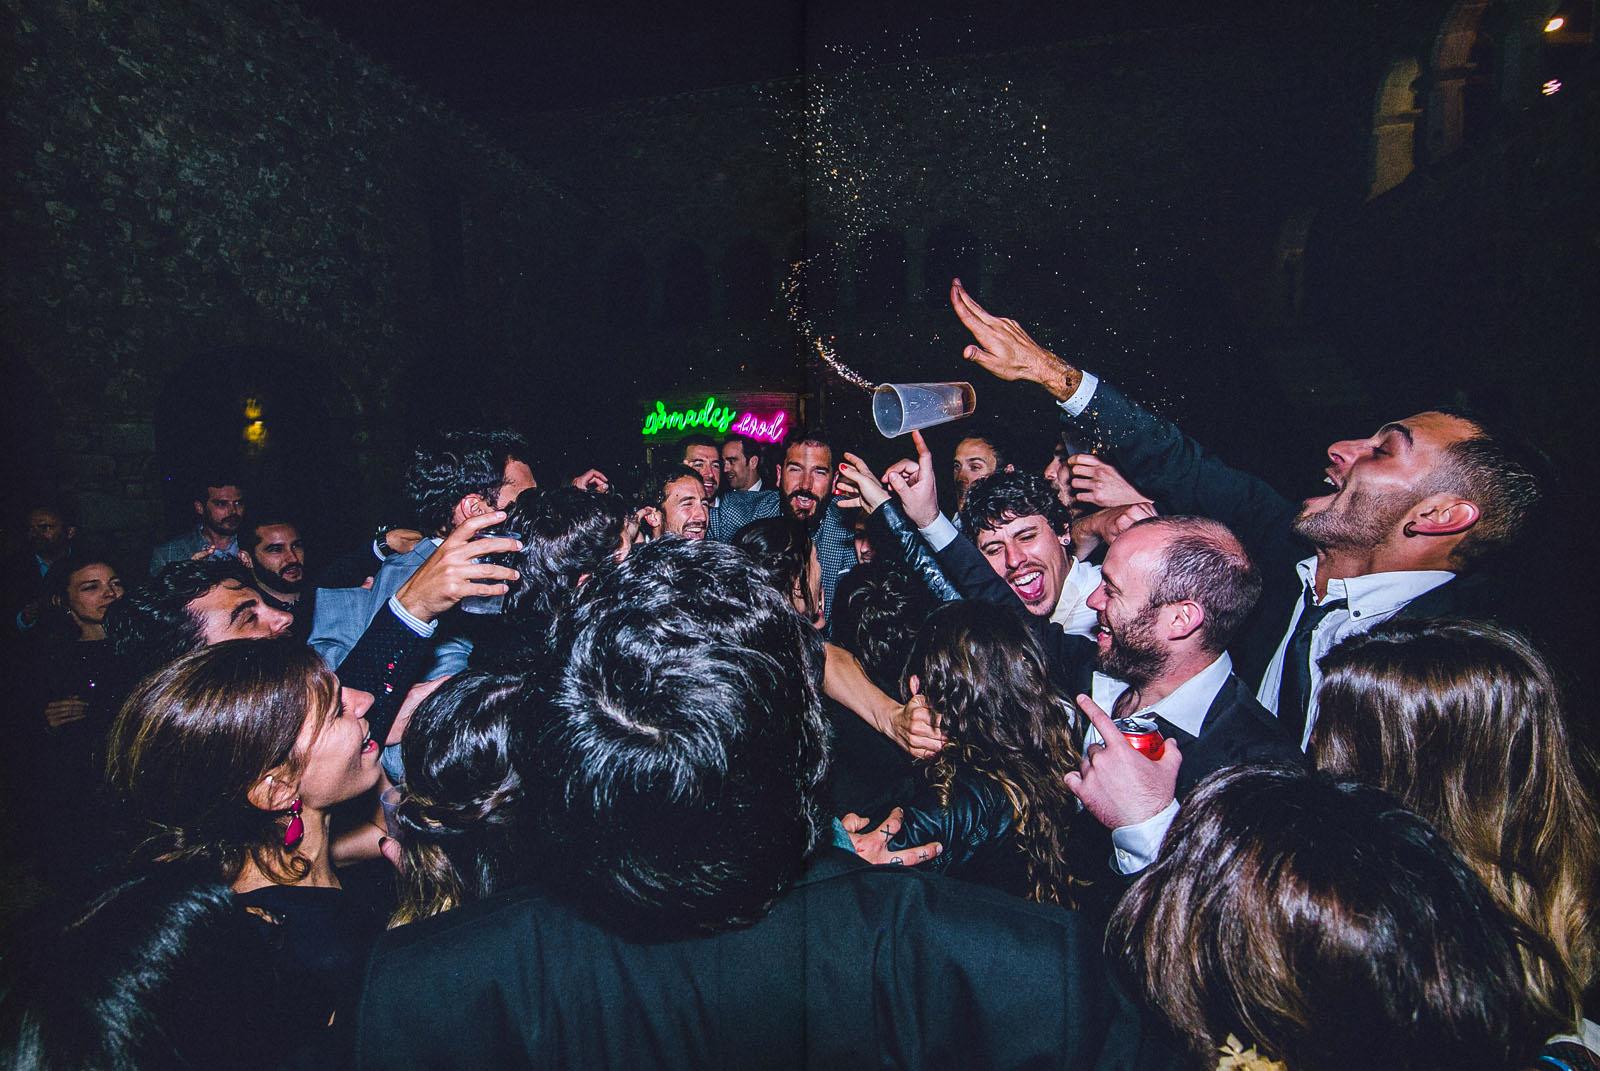 grupo de personas bailando saltando derramando alcohol